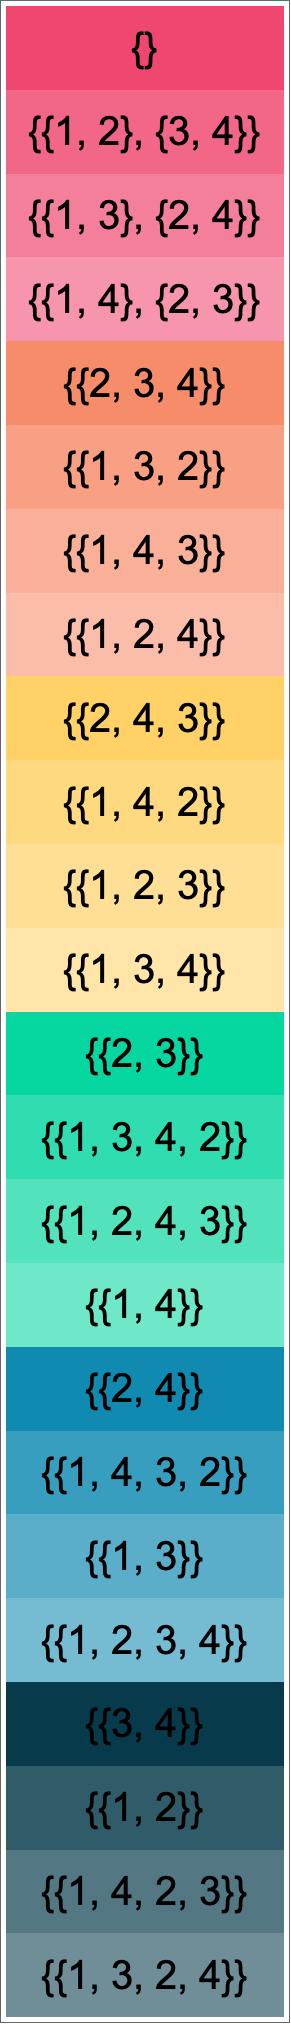 sixcolors